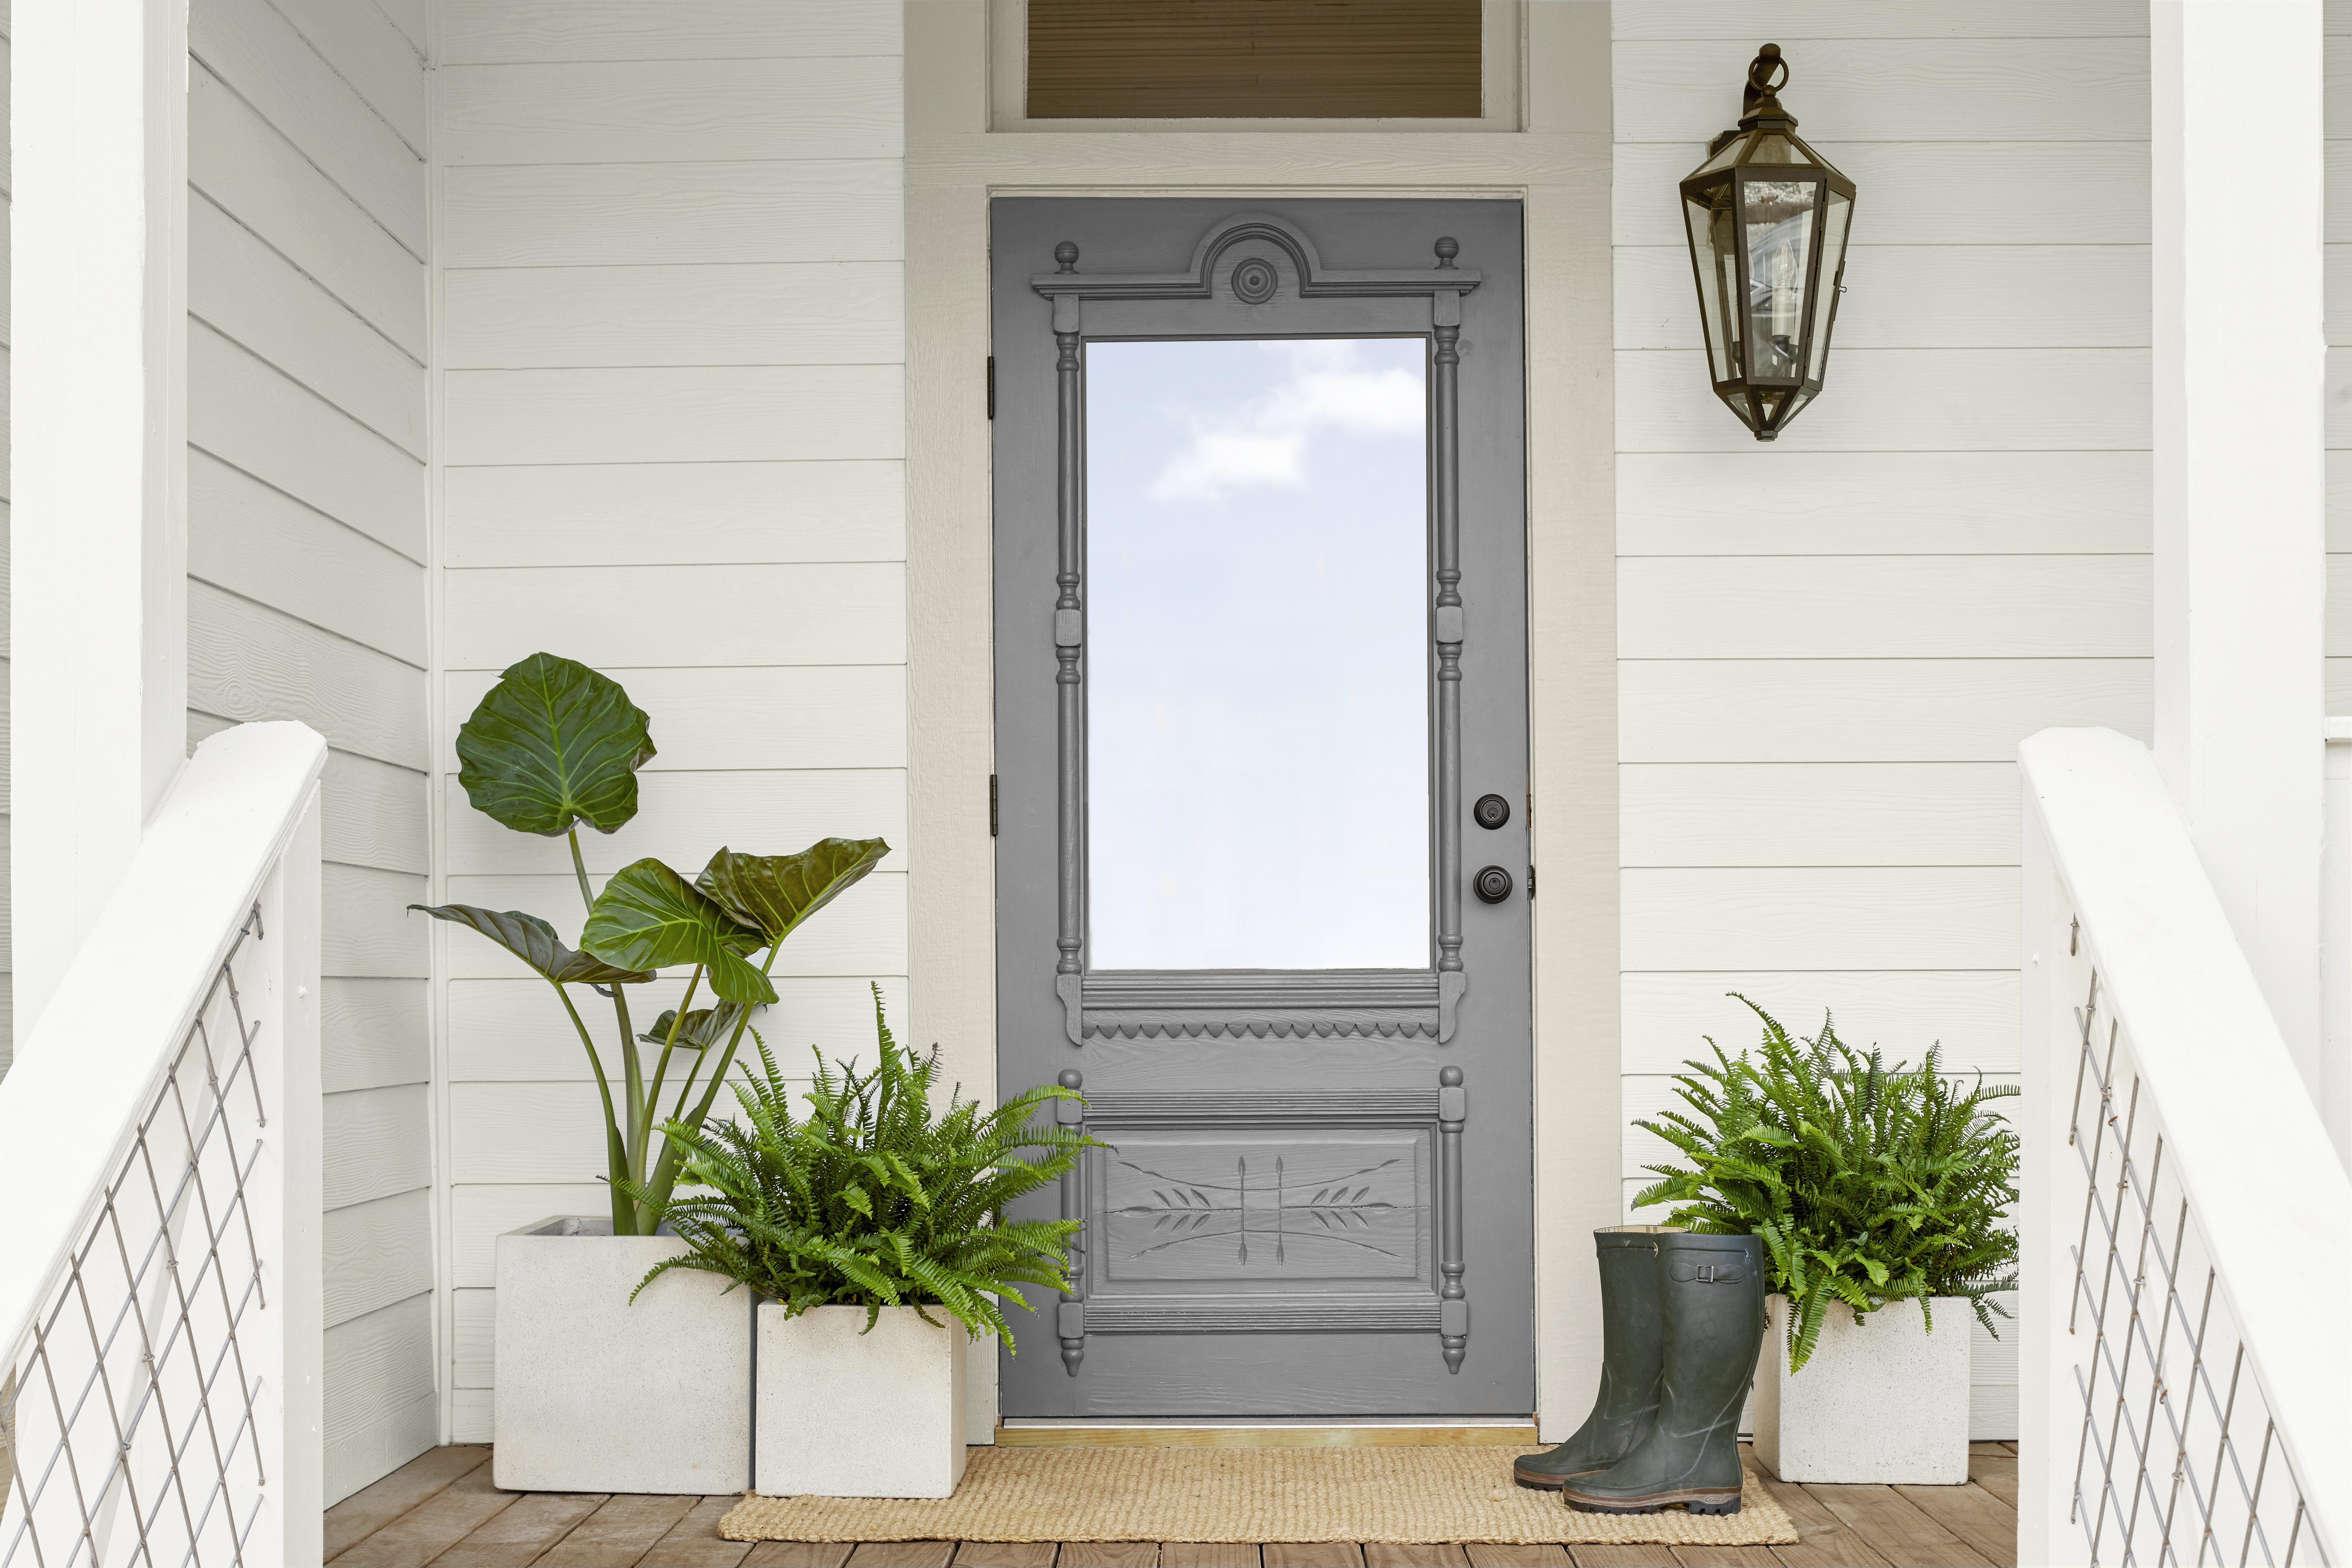 porch-with-grey-door-and-plants-hor.jpg